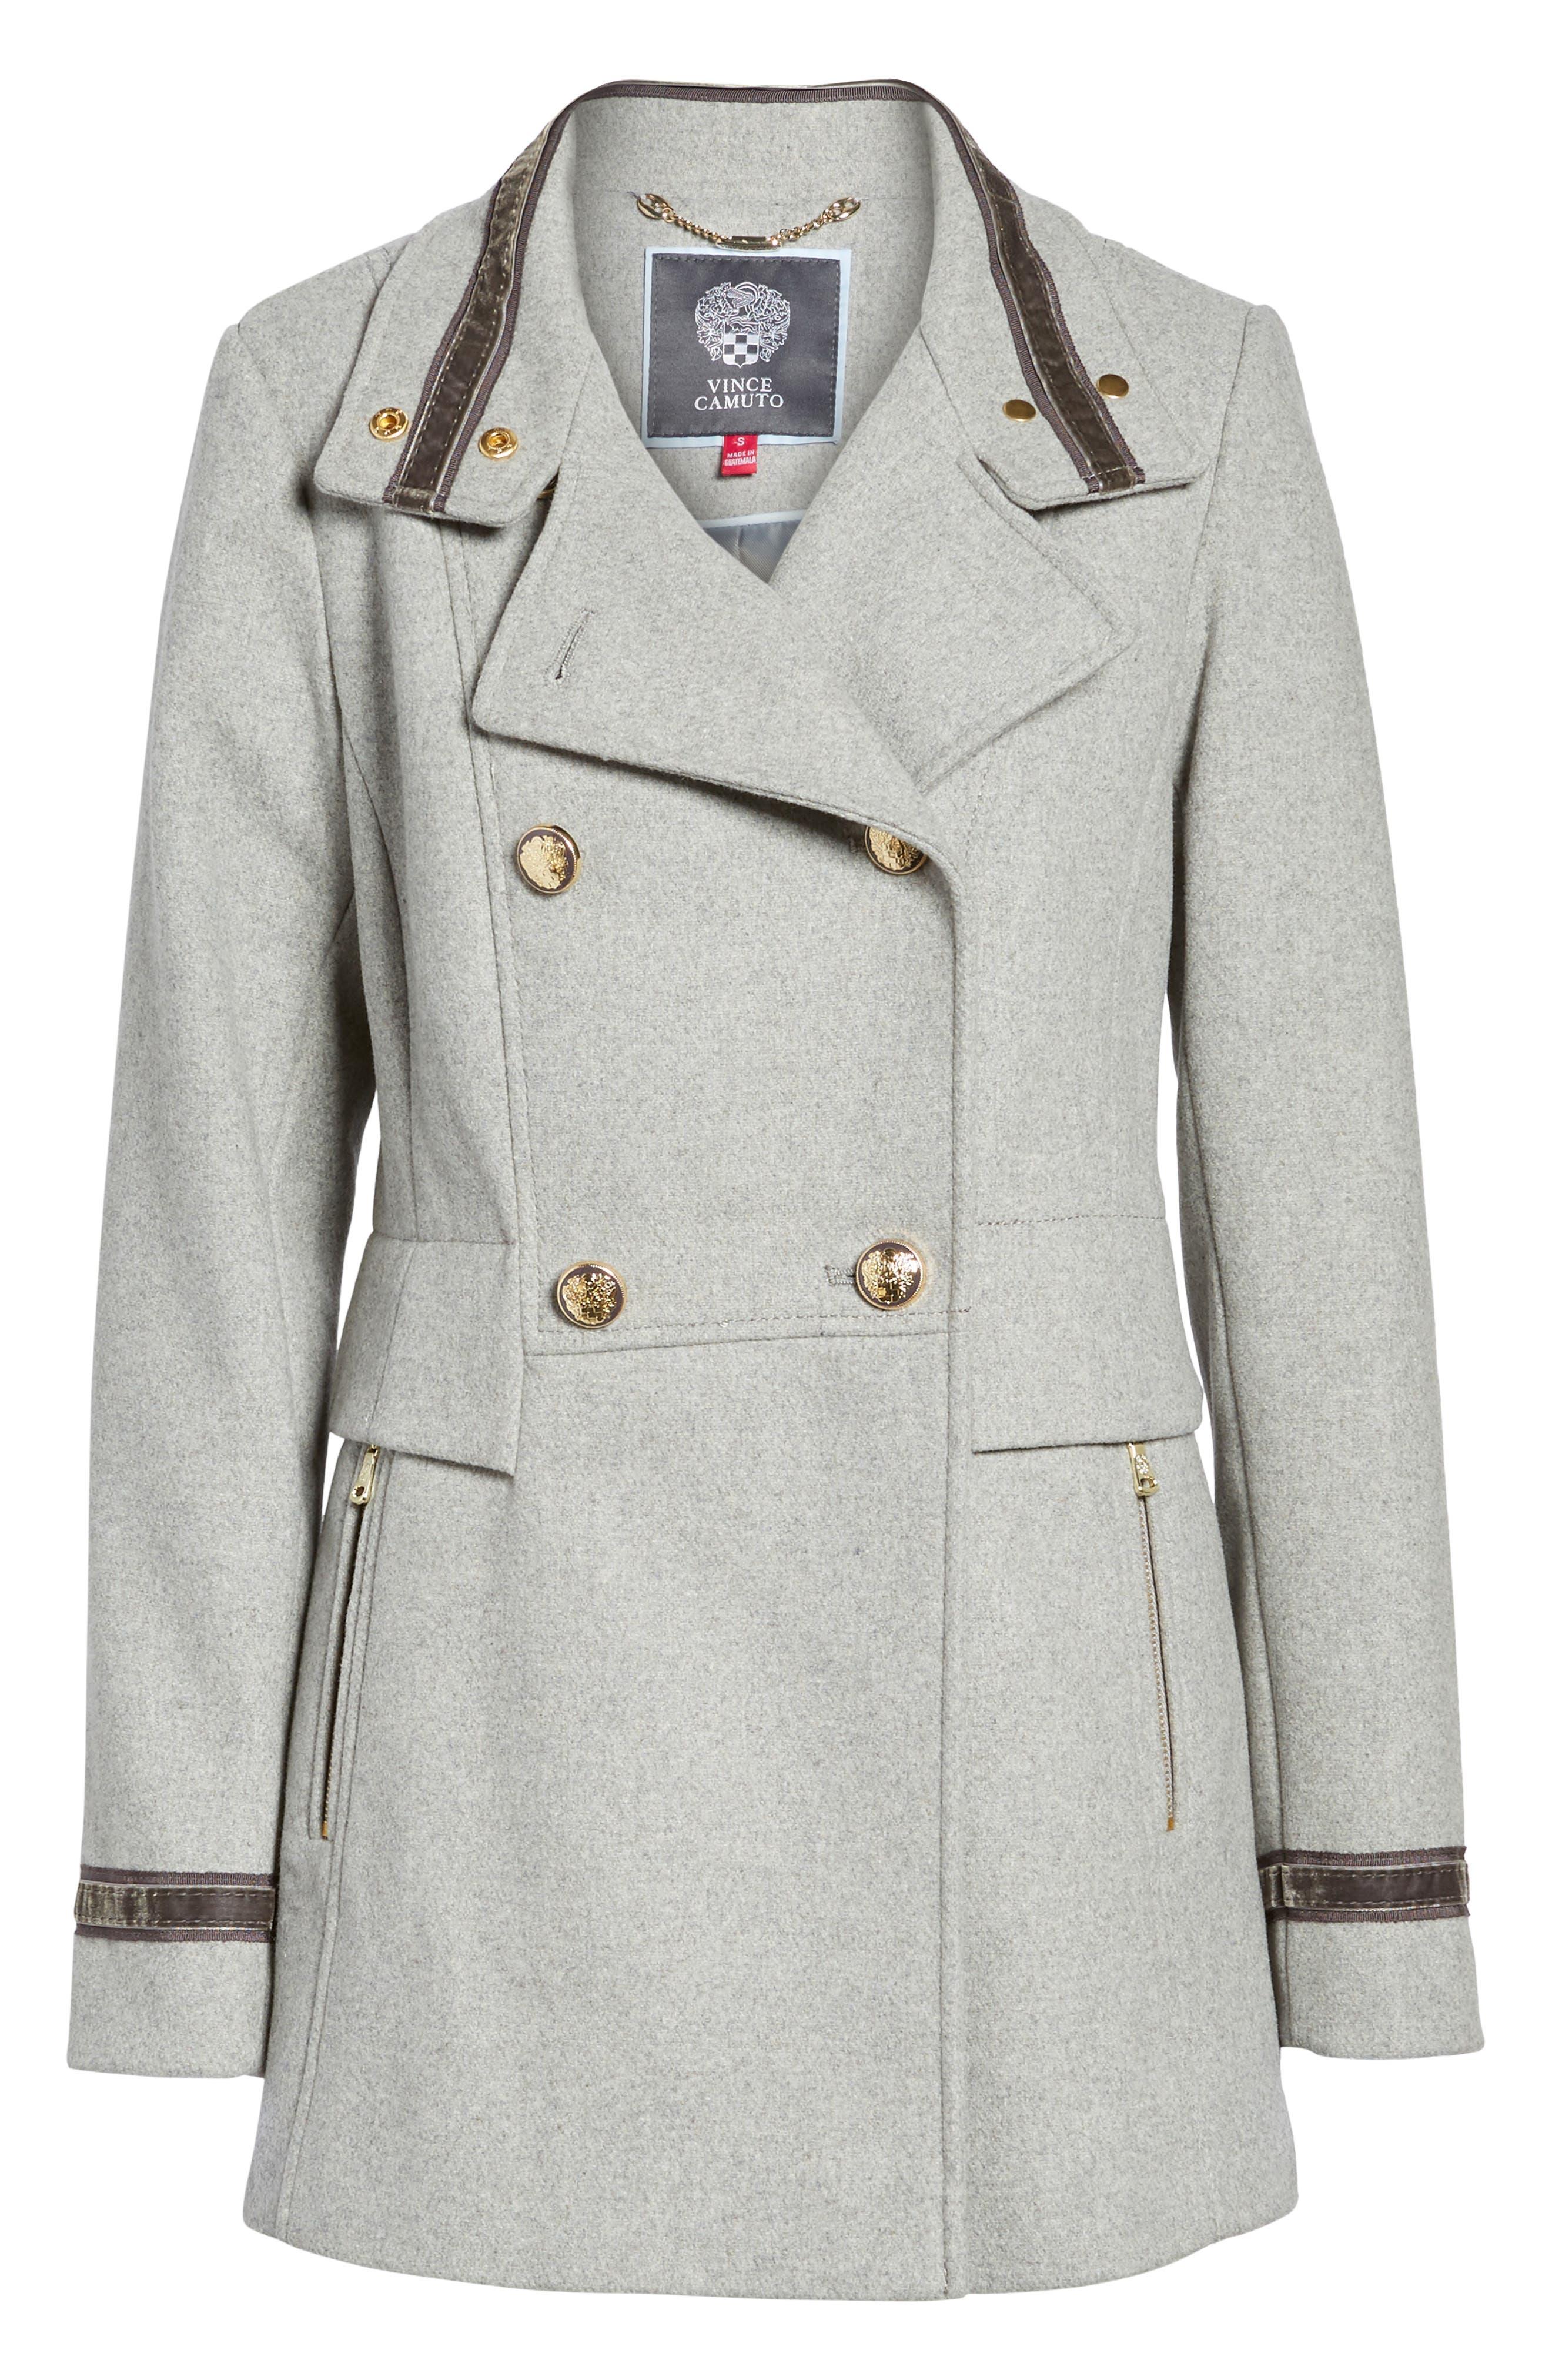 Wool Blend Military Coat,                         Main,                         color, Light Grey